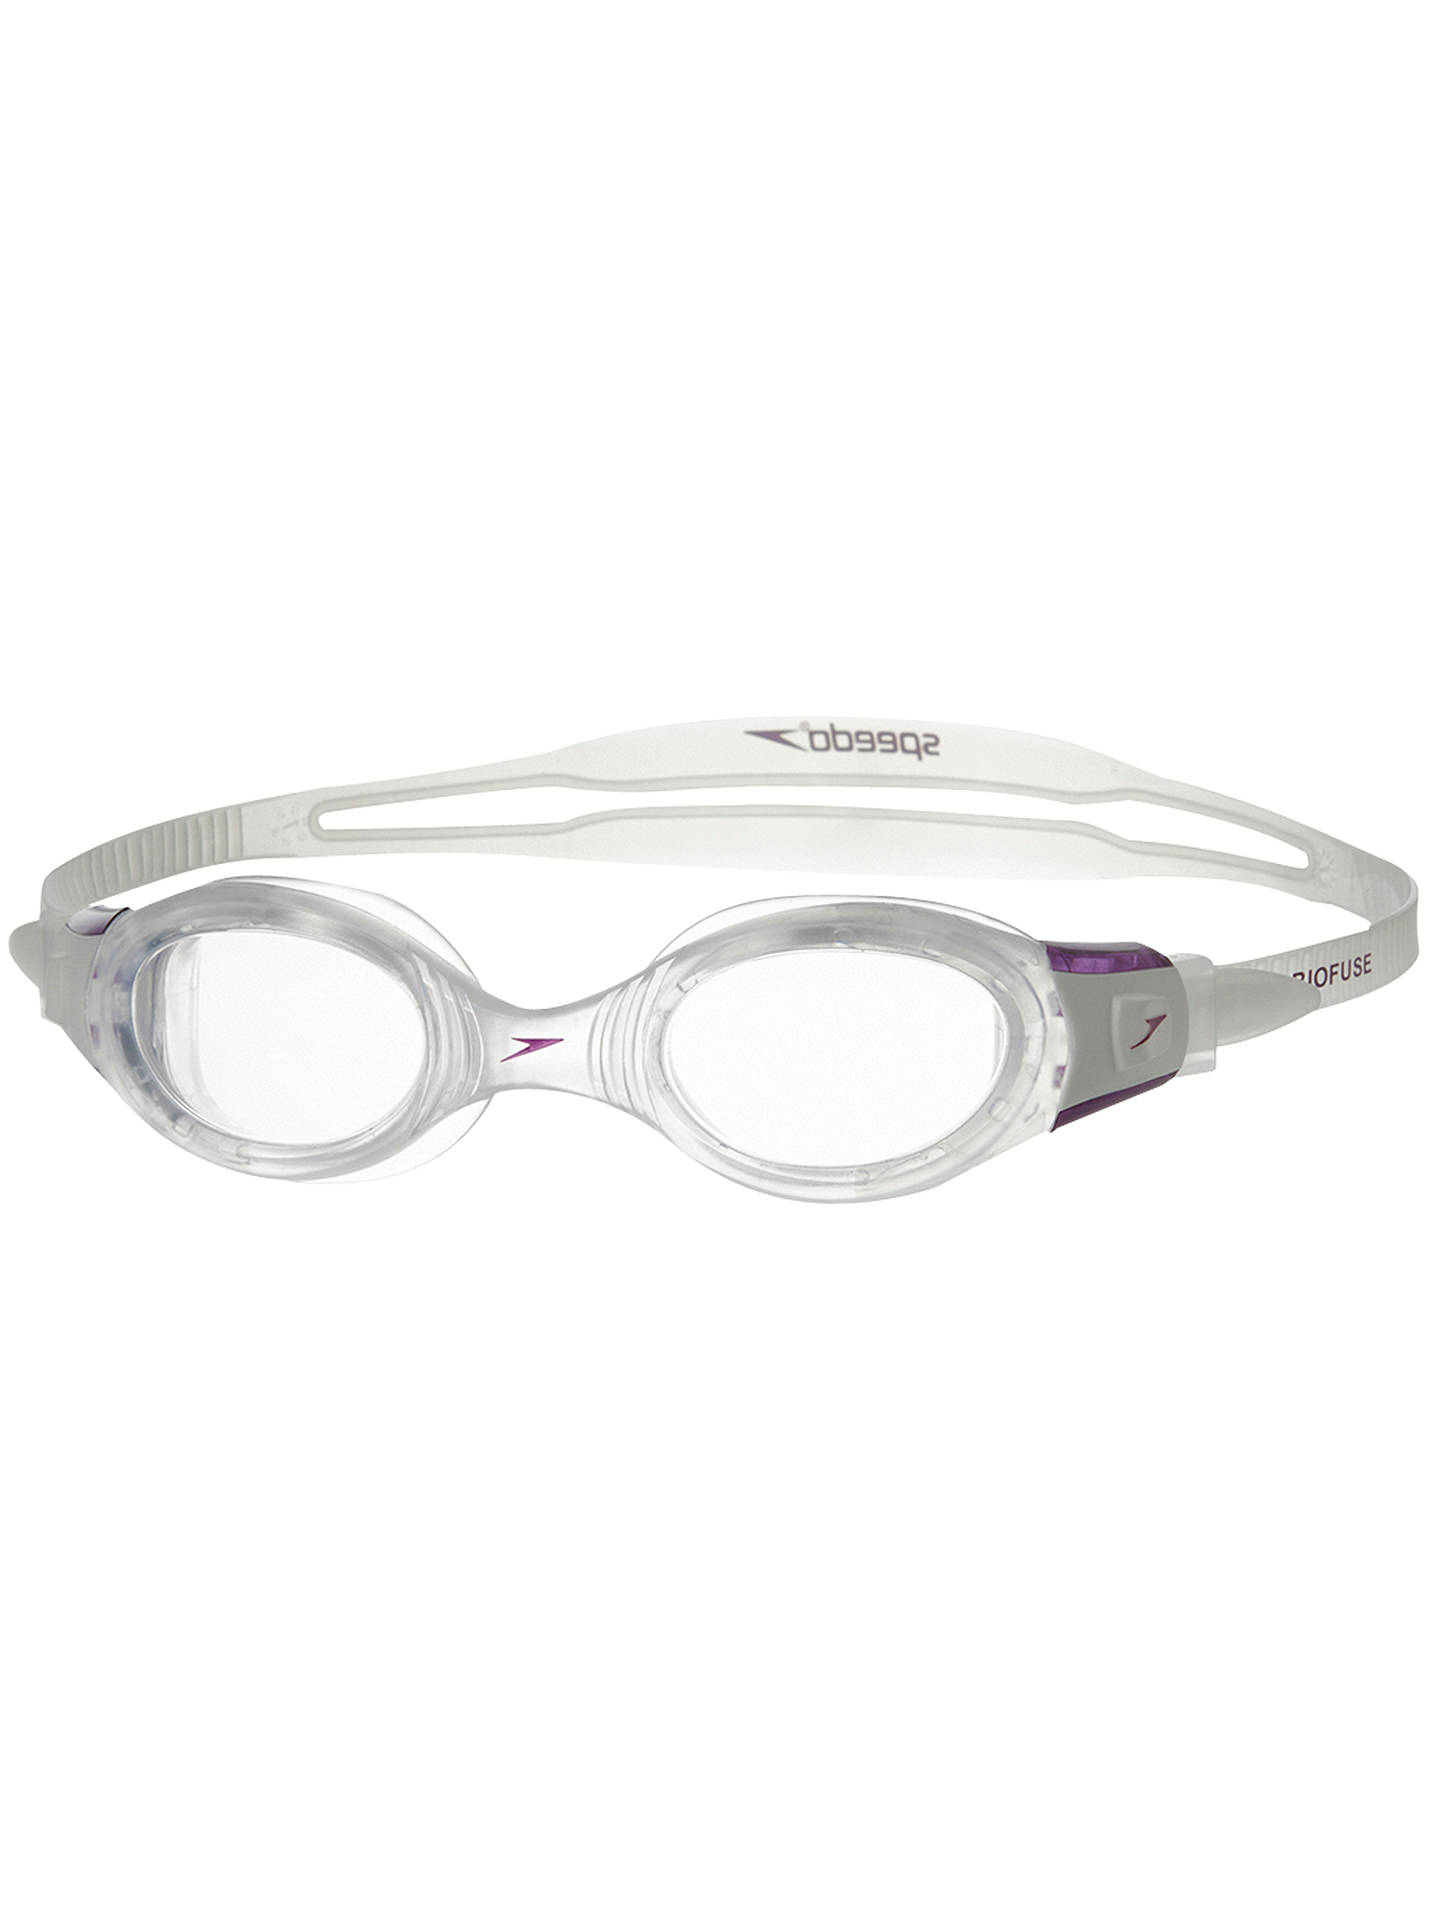 8bcc687a283 Buy Speedo Women s Futura Biofuse Swimming Goggles